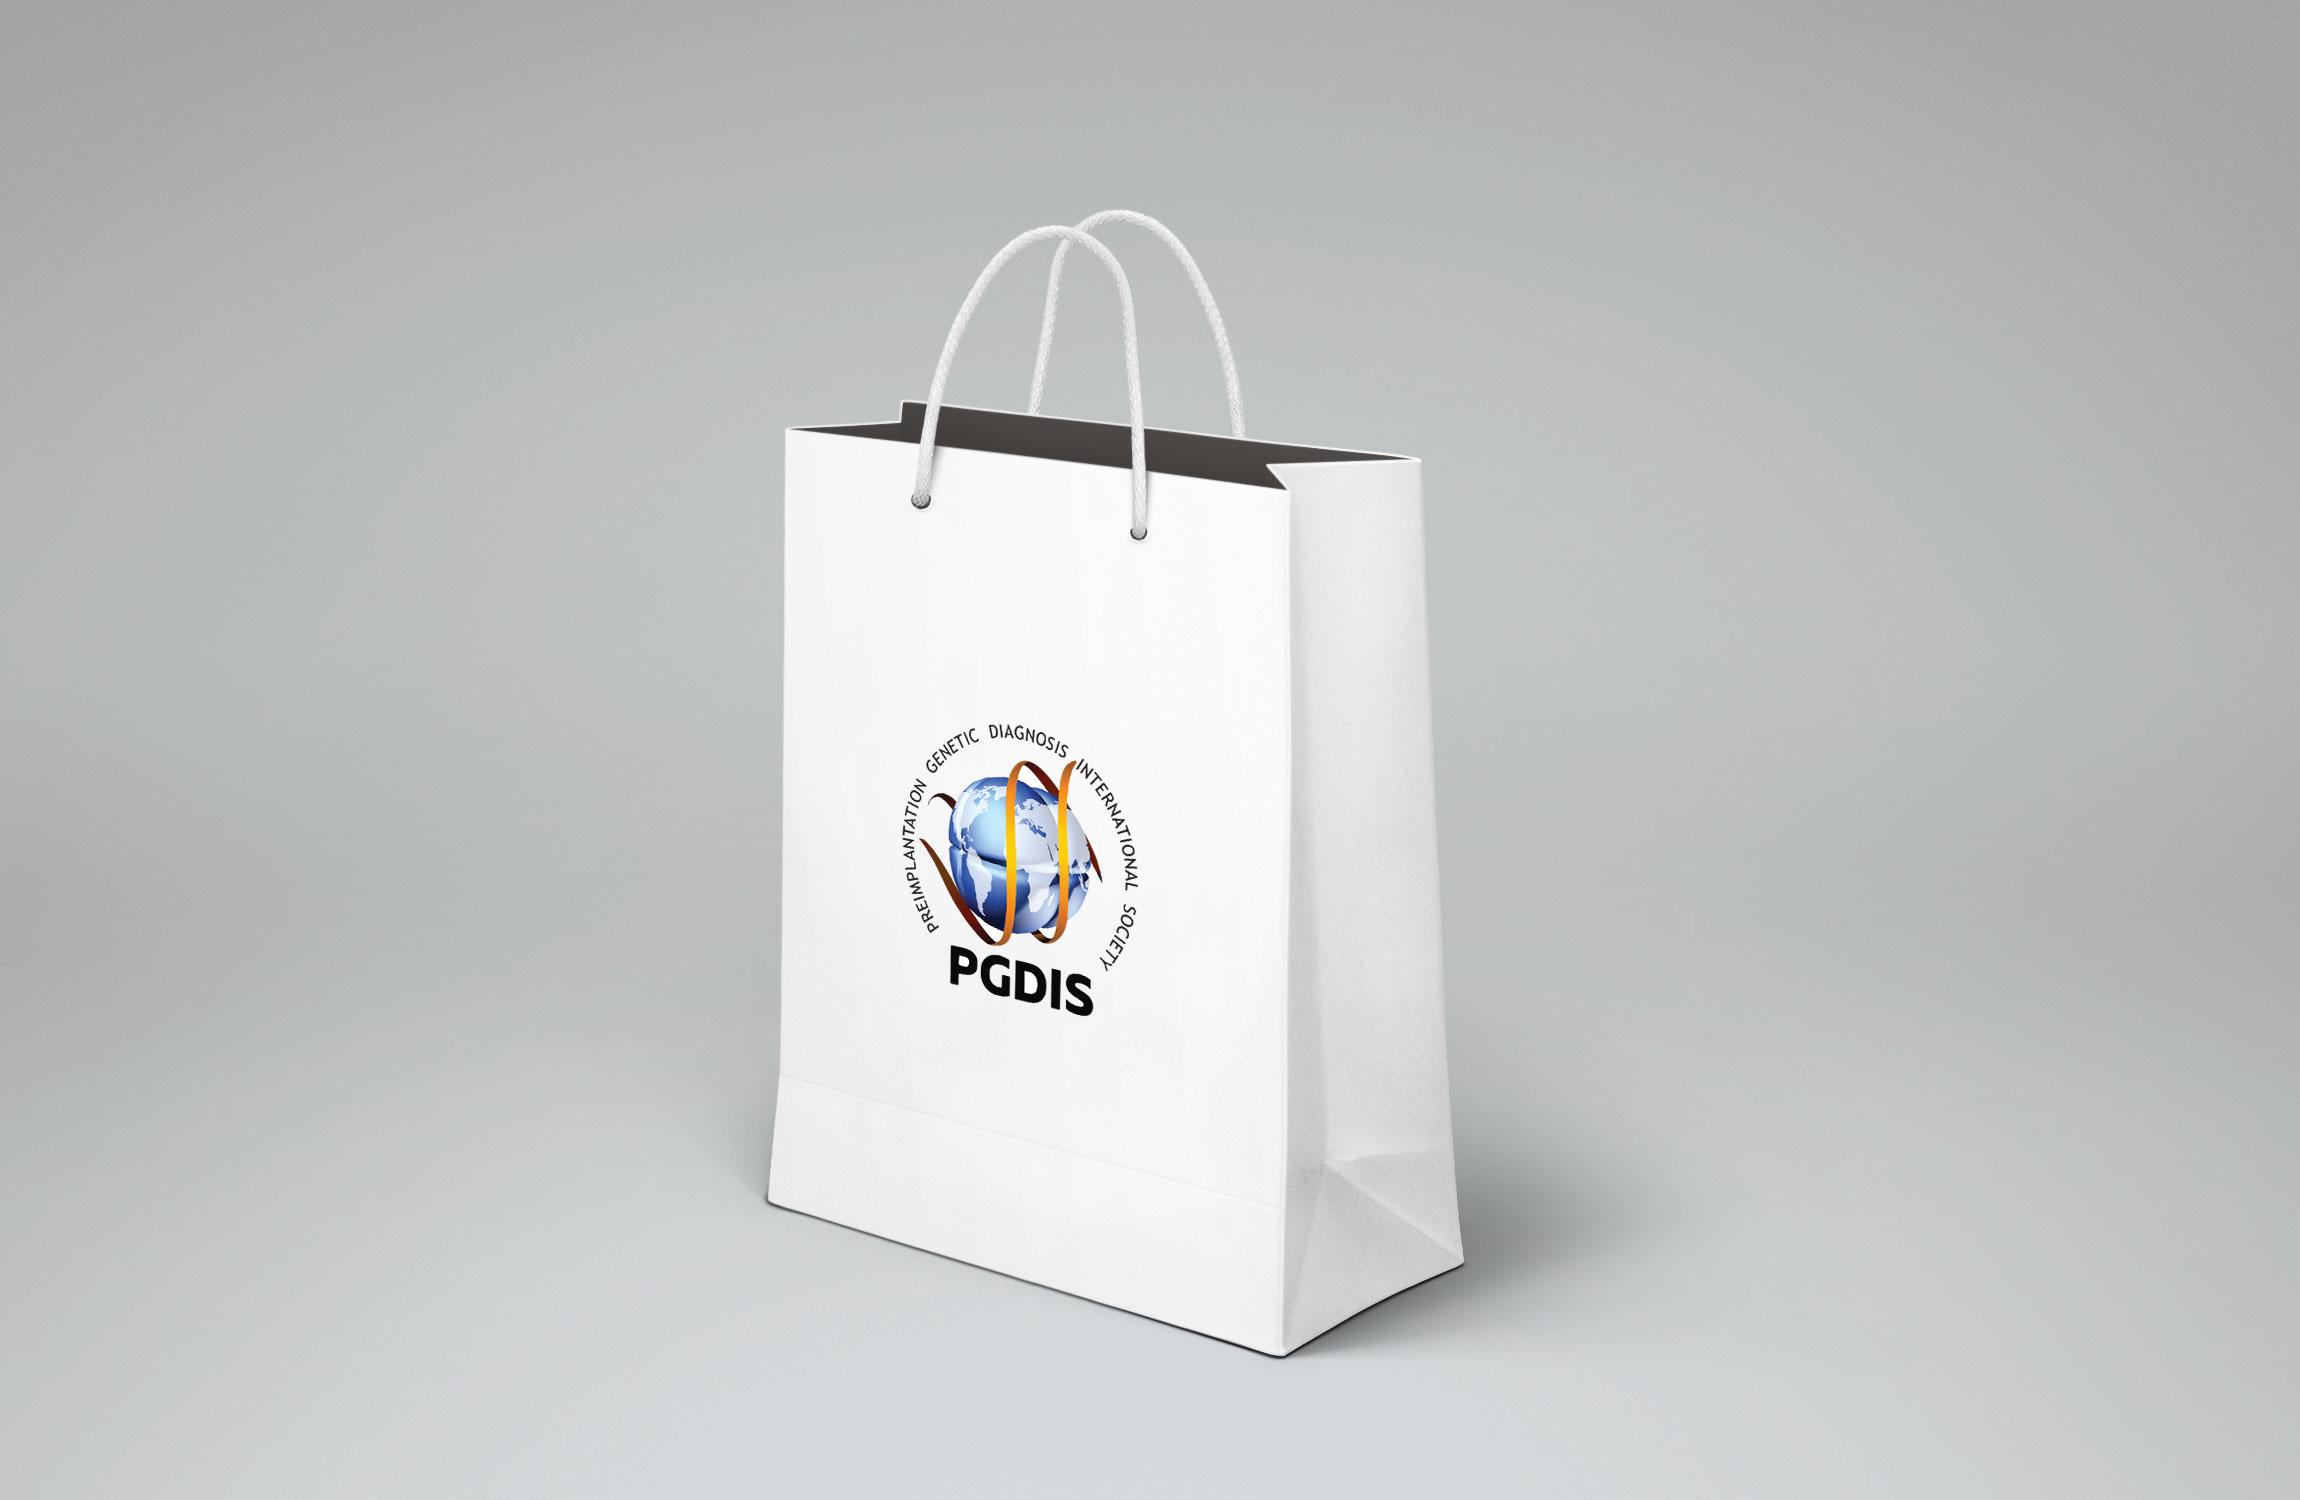 pgdis-logo-brand-isentity-revolando-01